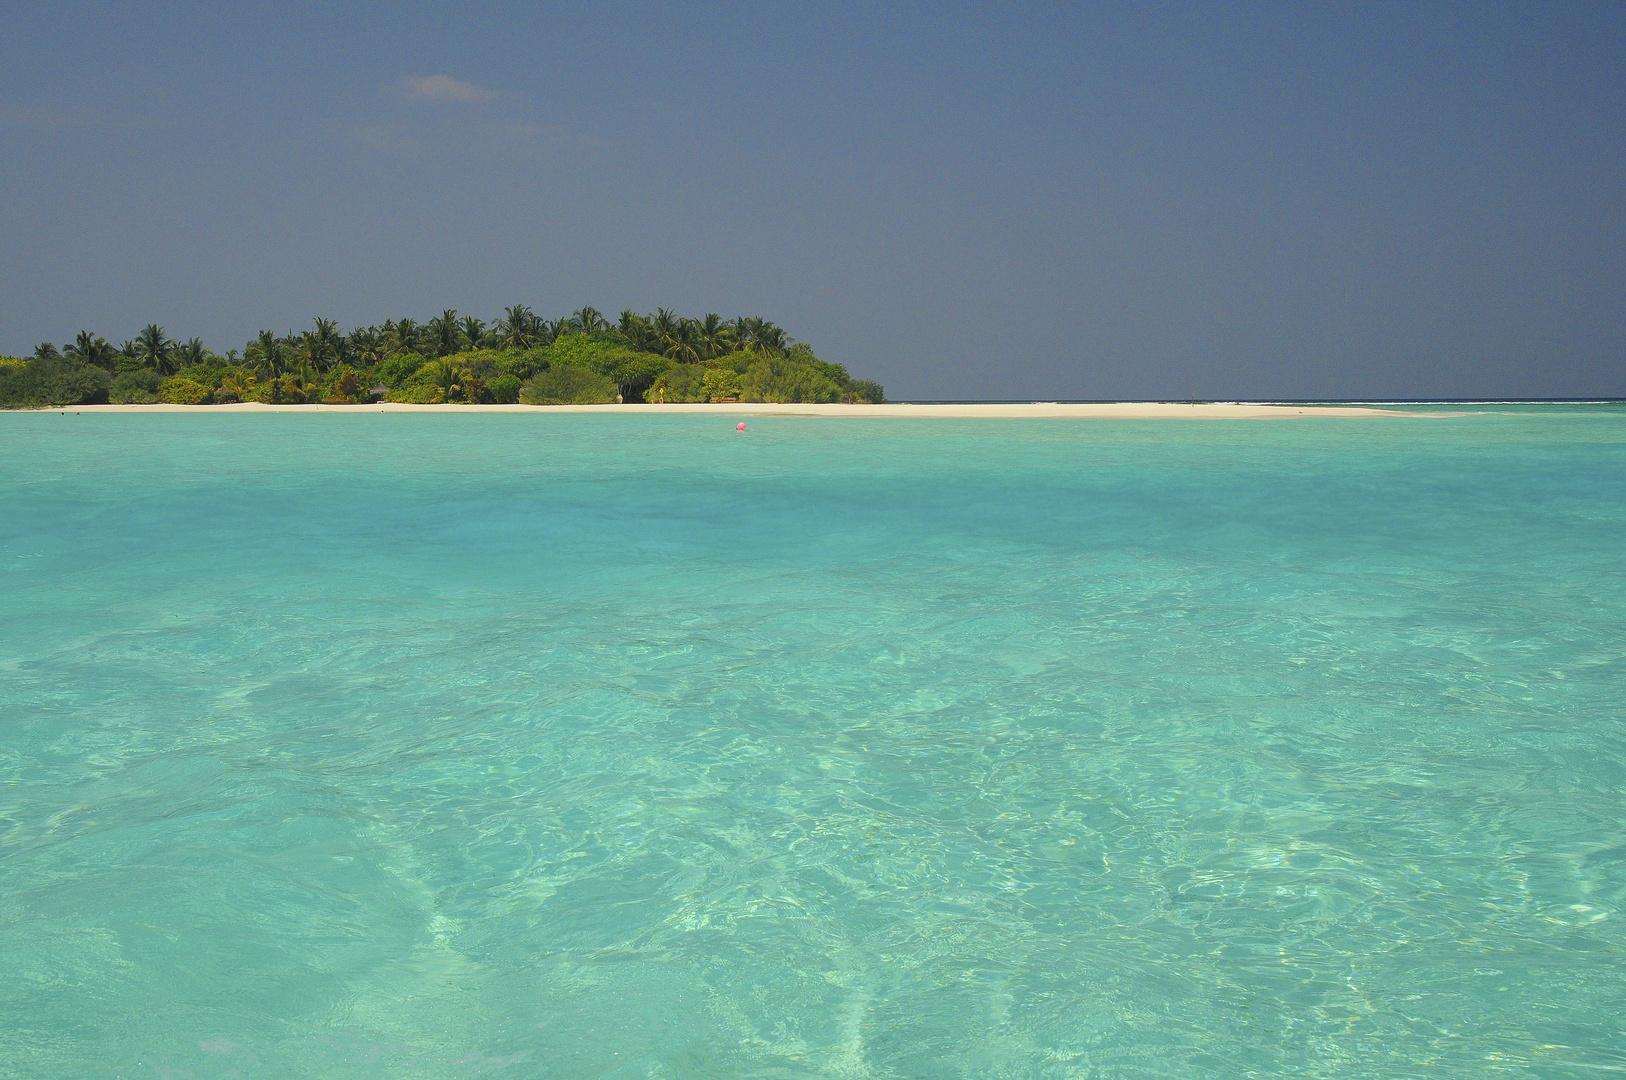 Jehunuhura Island